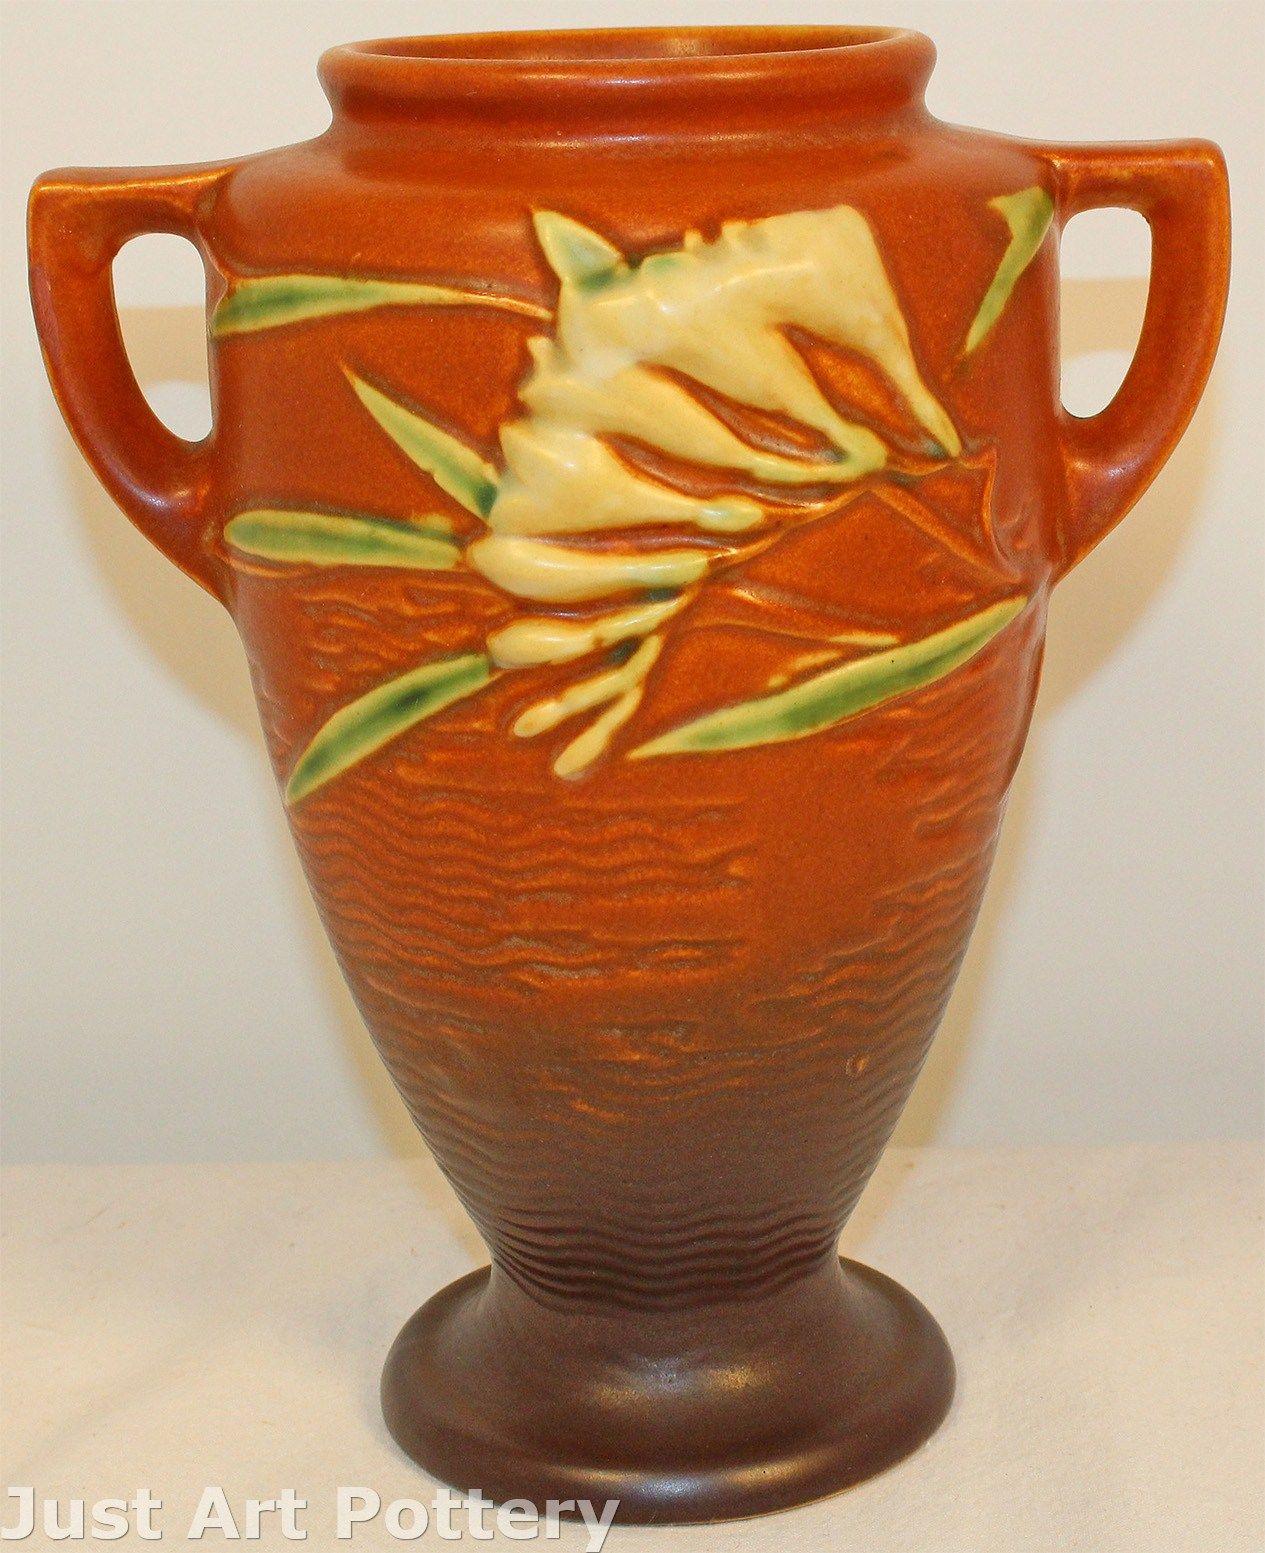 roseville pottery magnolia vase of just art pottery www imagenesmy com with roseville pottery freesia brown vase from just art pottery jpg 1265x1553 just art pottery